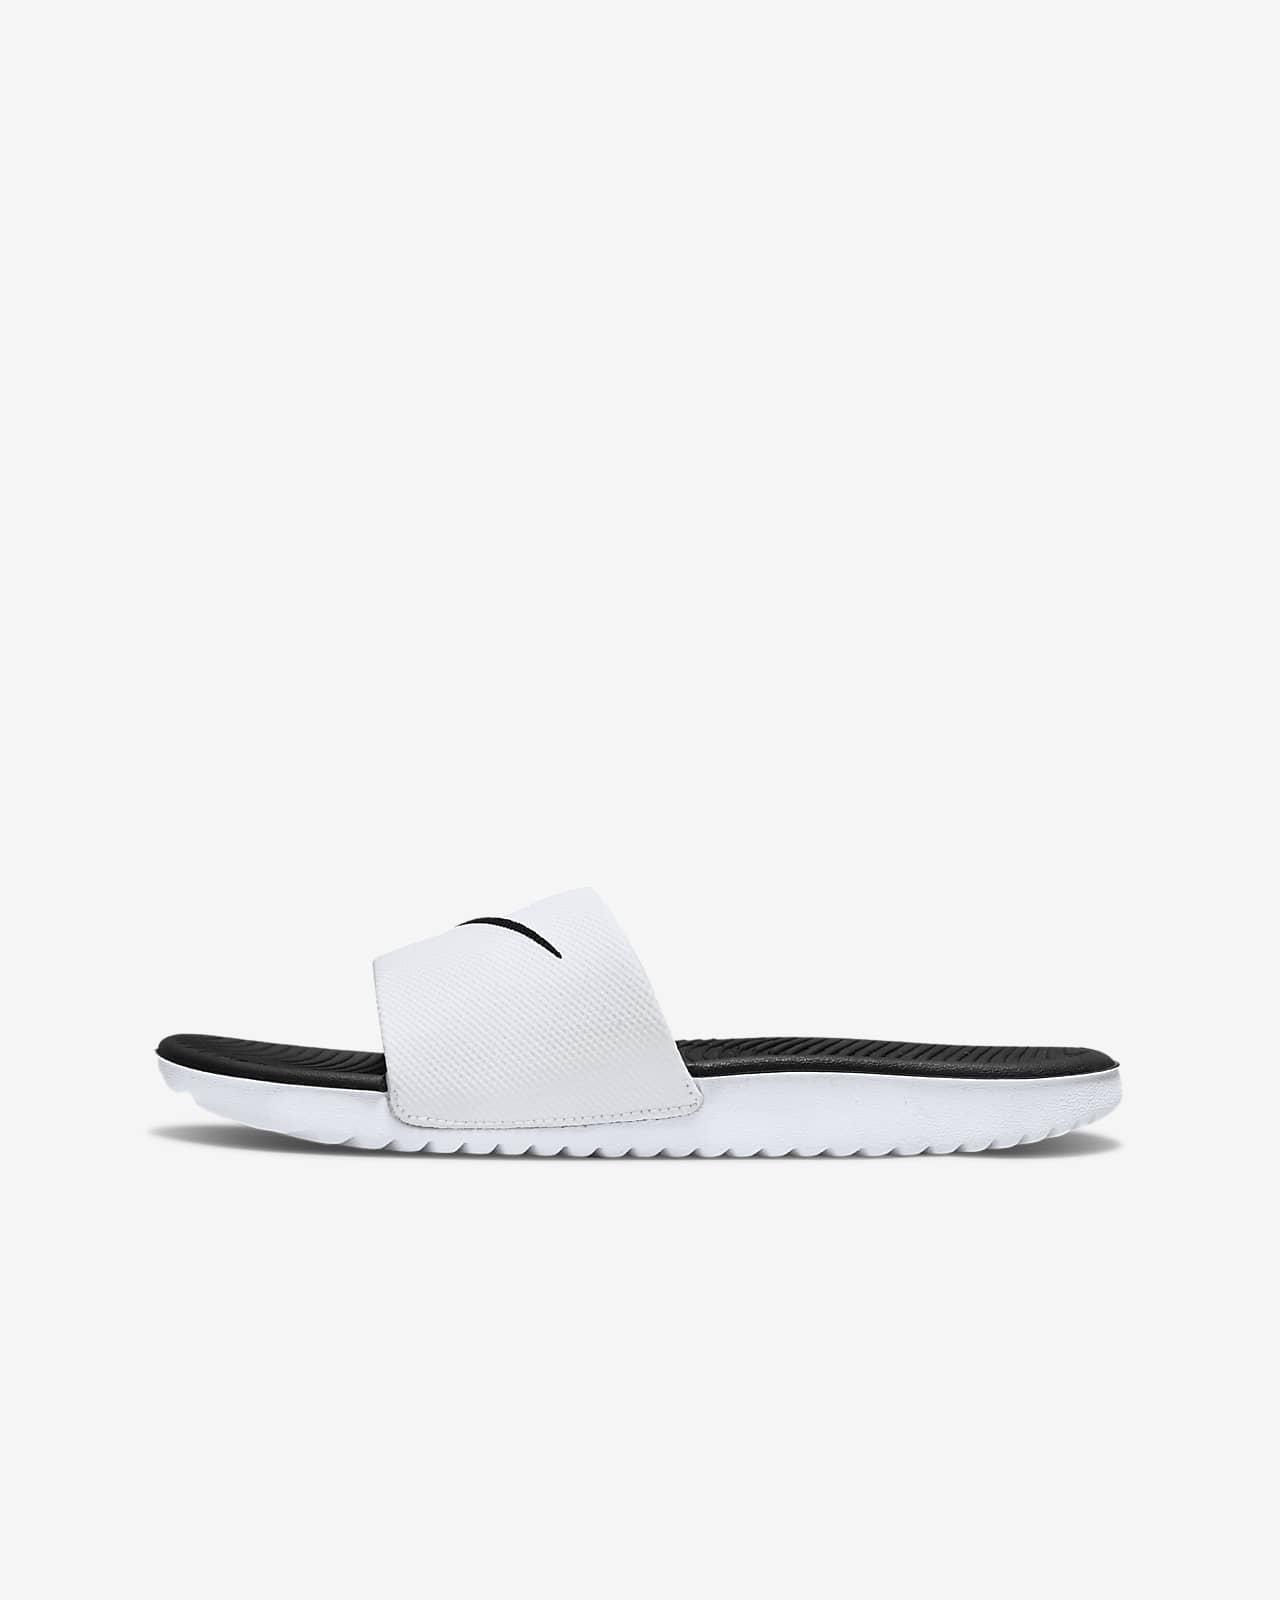 Badtoffel Nike Kawa för barn/ungdom